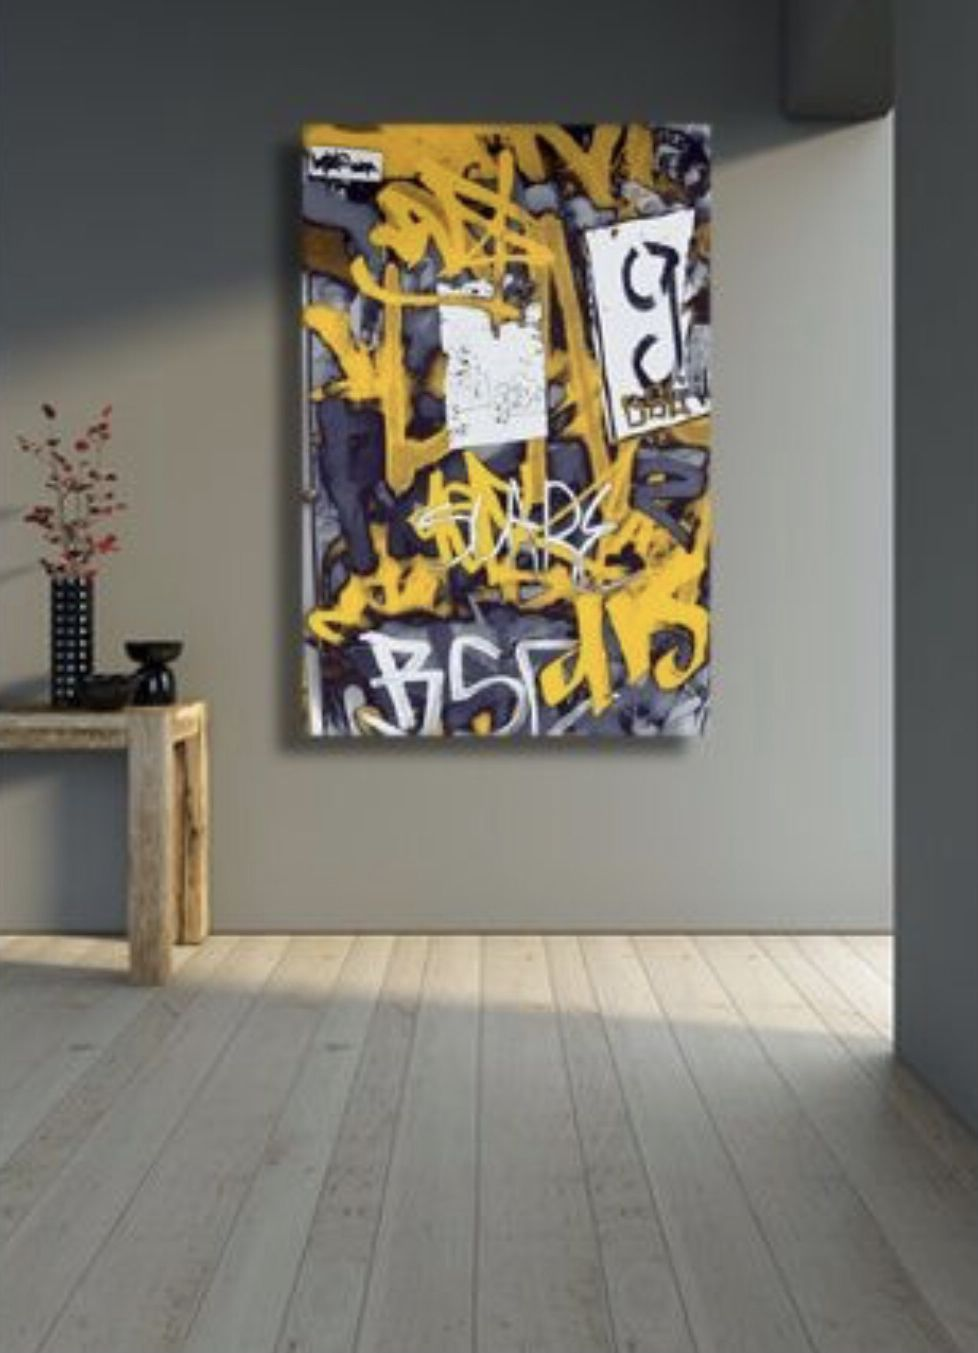 Pin By Dani Wilson On A A Another Abstraction Graffiti Canvas Art Graffiti Wall Art Interior Art